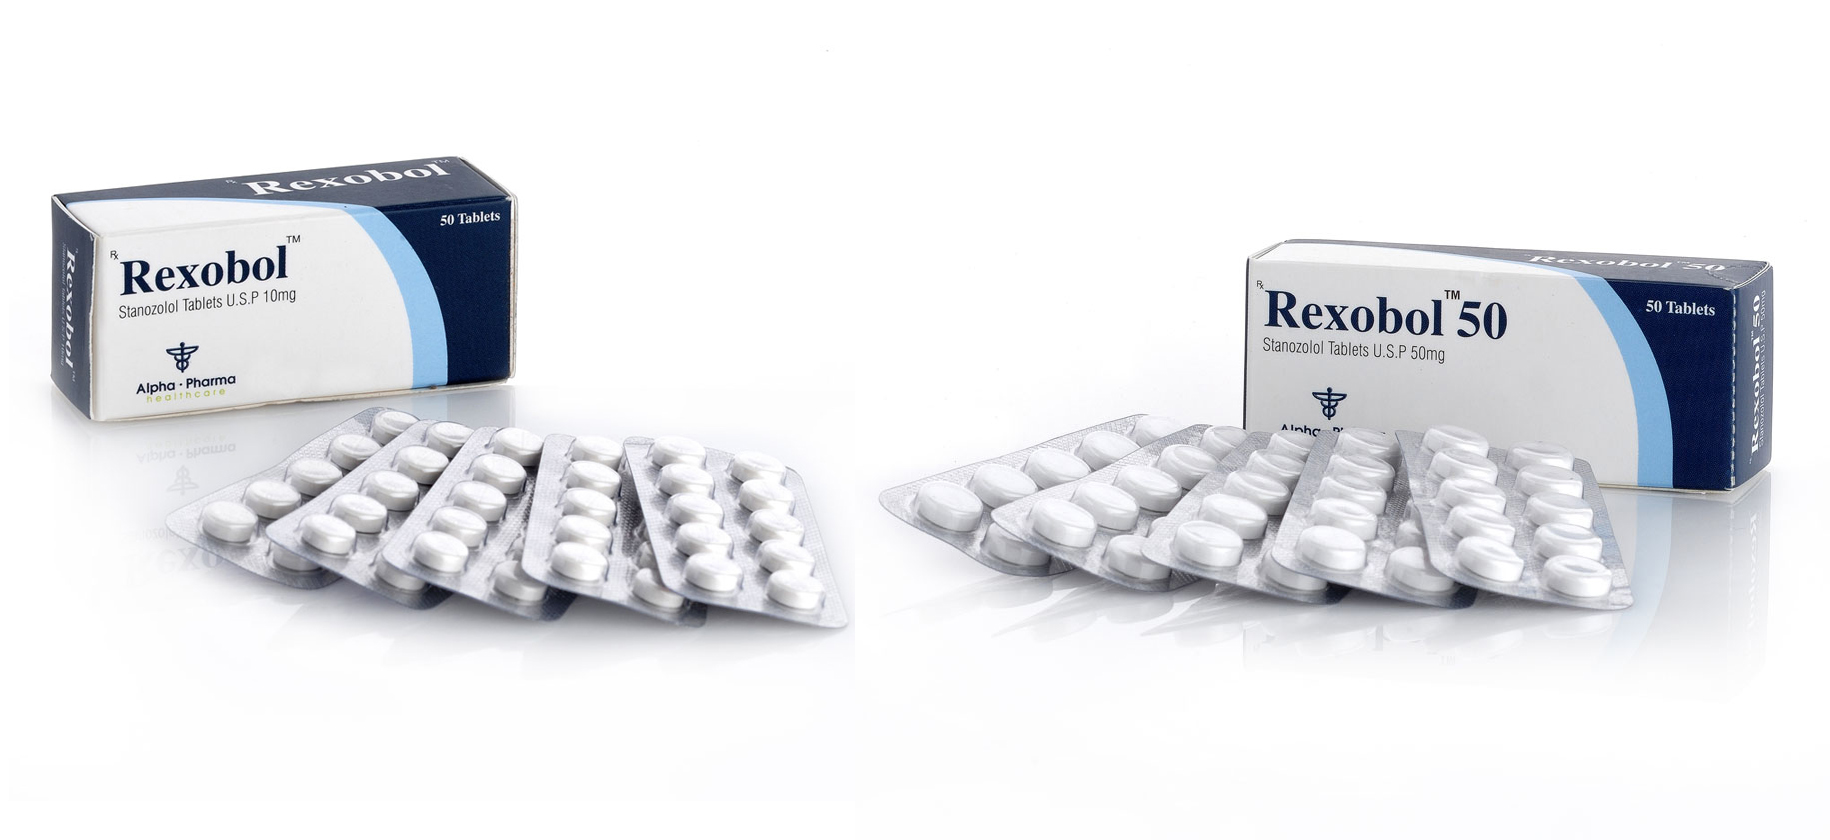 Rexobol Alpha-Pharma